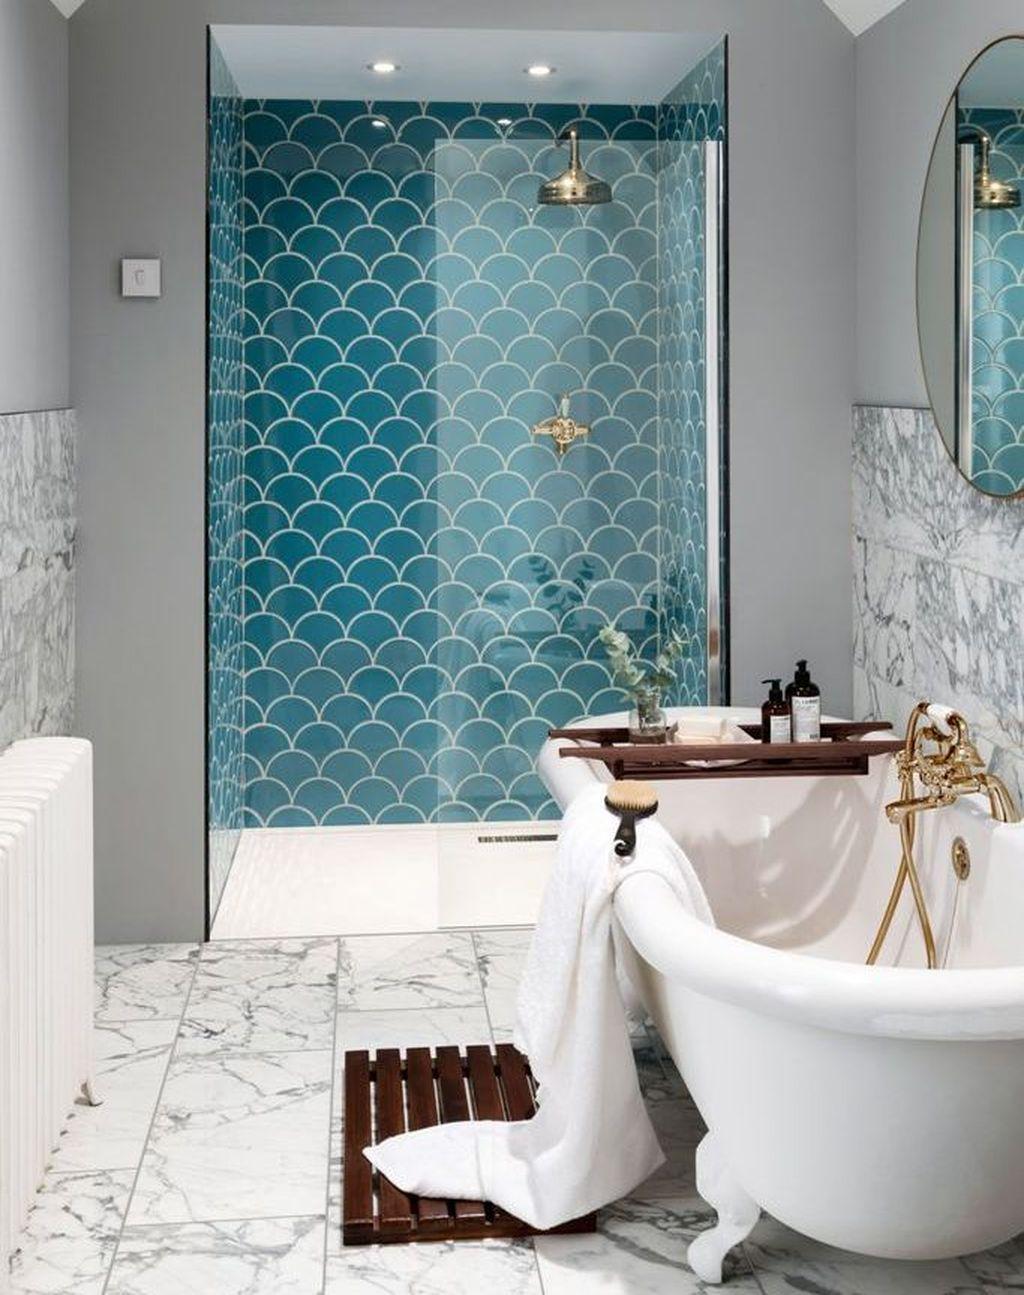 Latest Bathroom Design Ideas To Try Asap 24